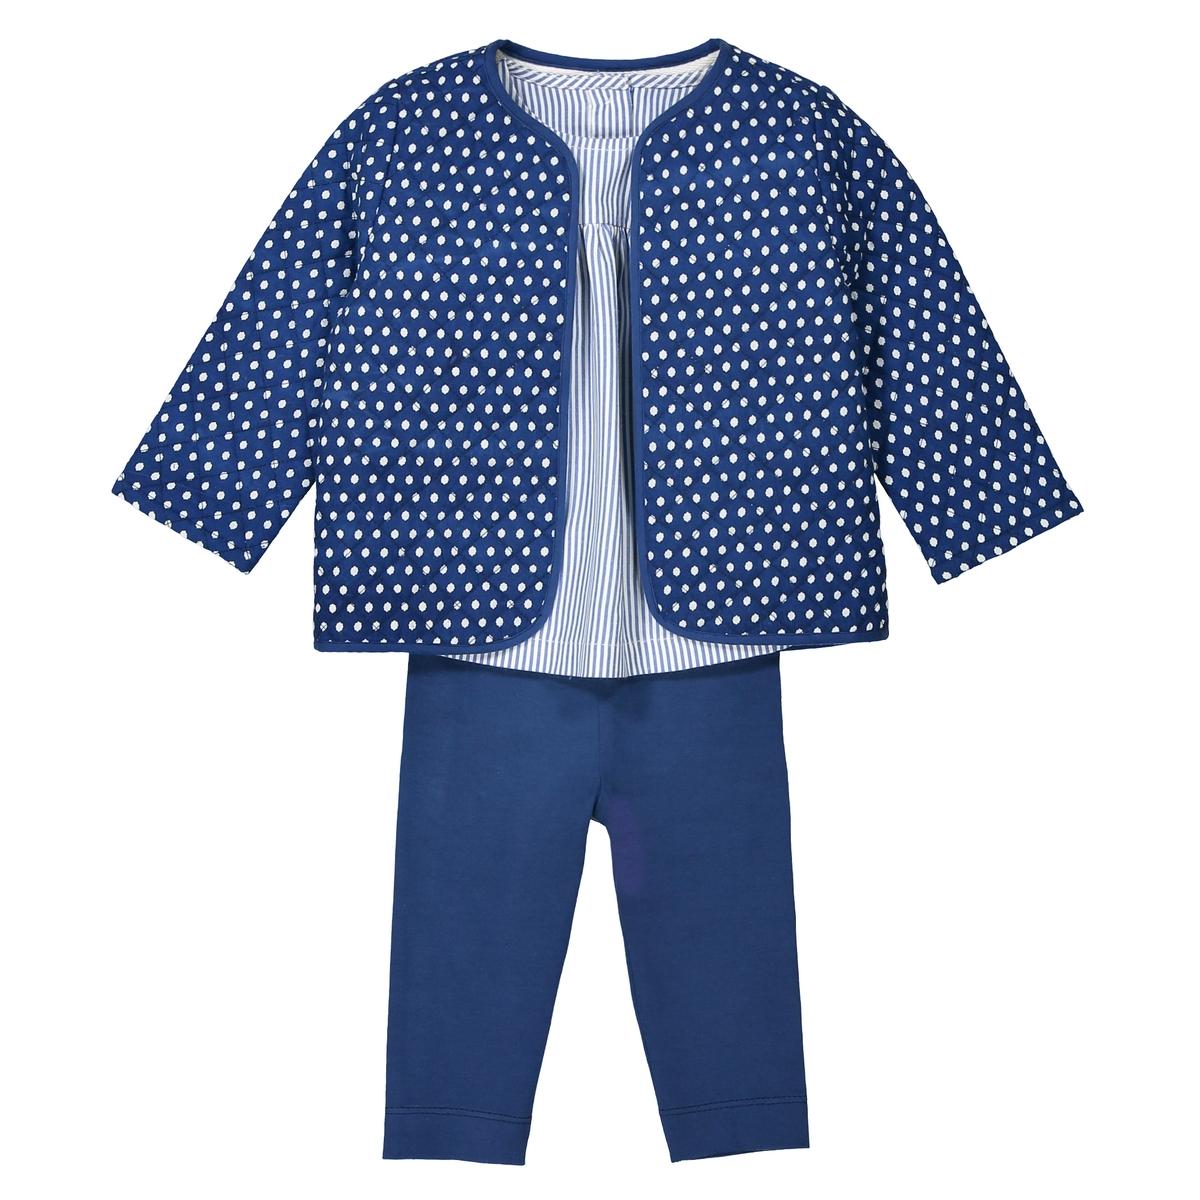 Комплект из куртки, блузки и леггинсов 1 мес. – 3 года блузки и рубашки